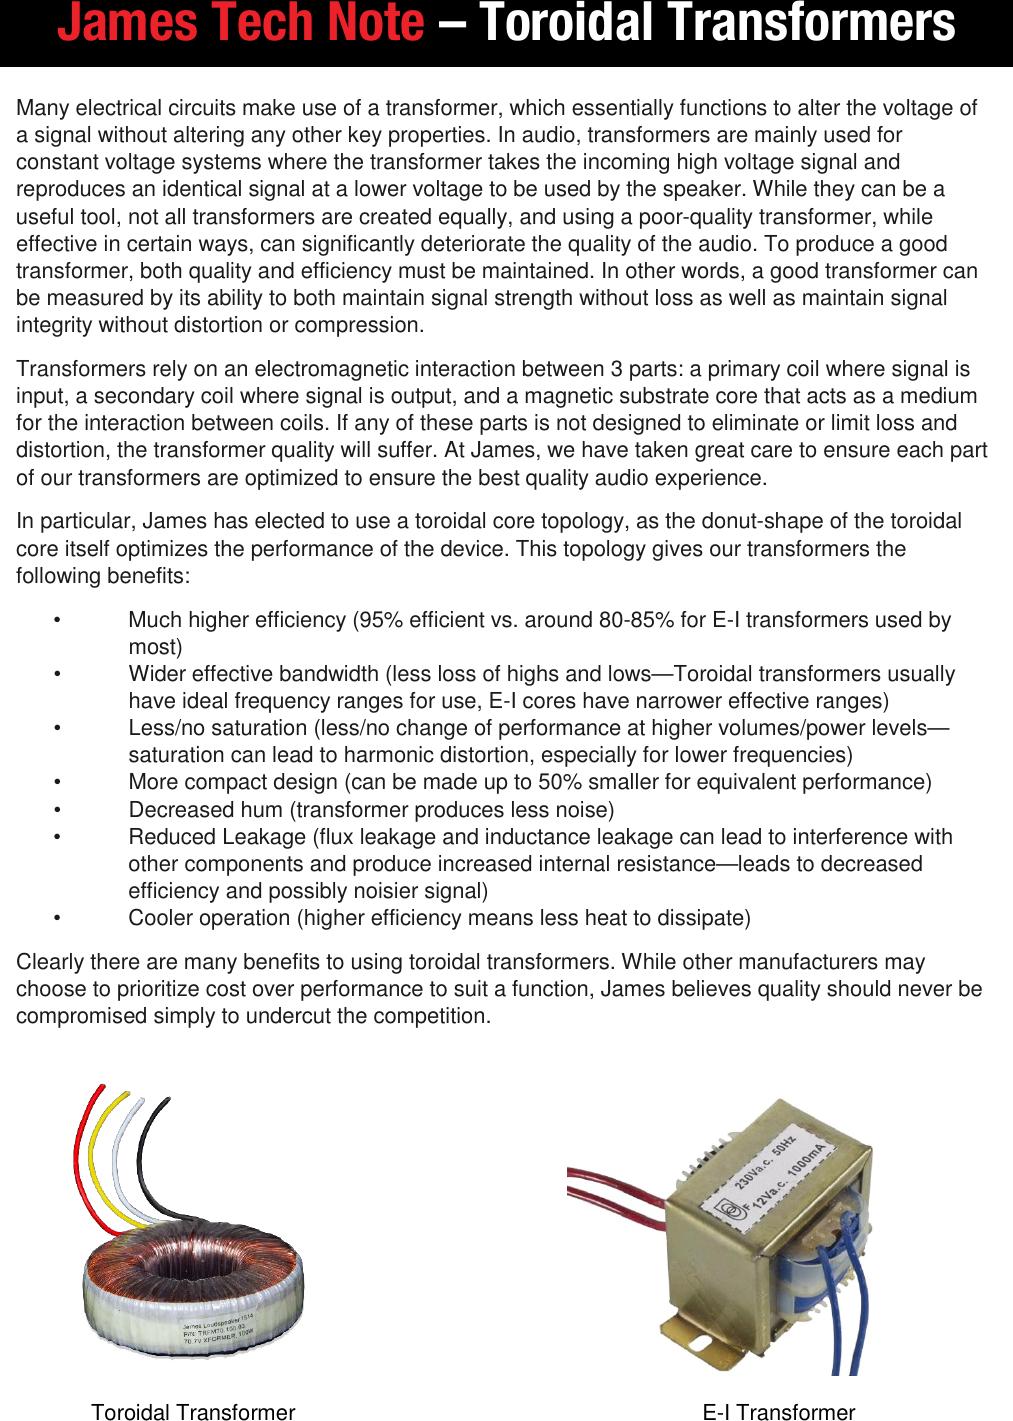 Toroidal Transformer Tech Note